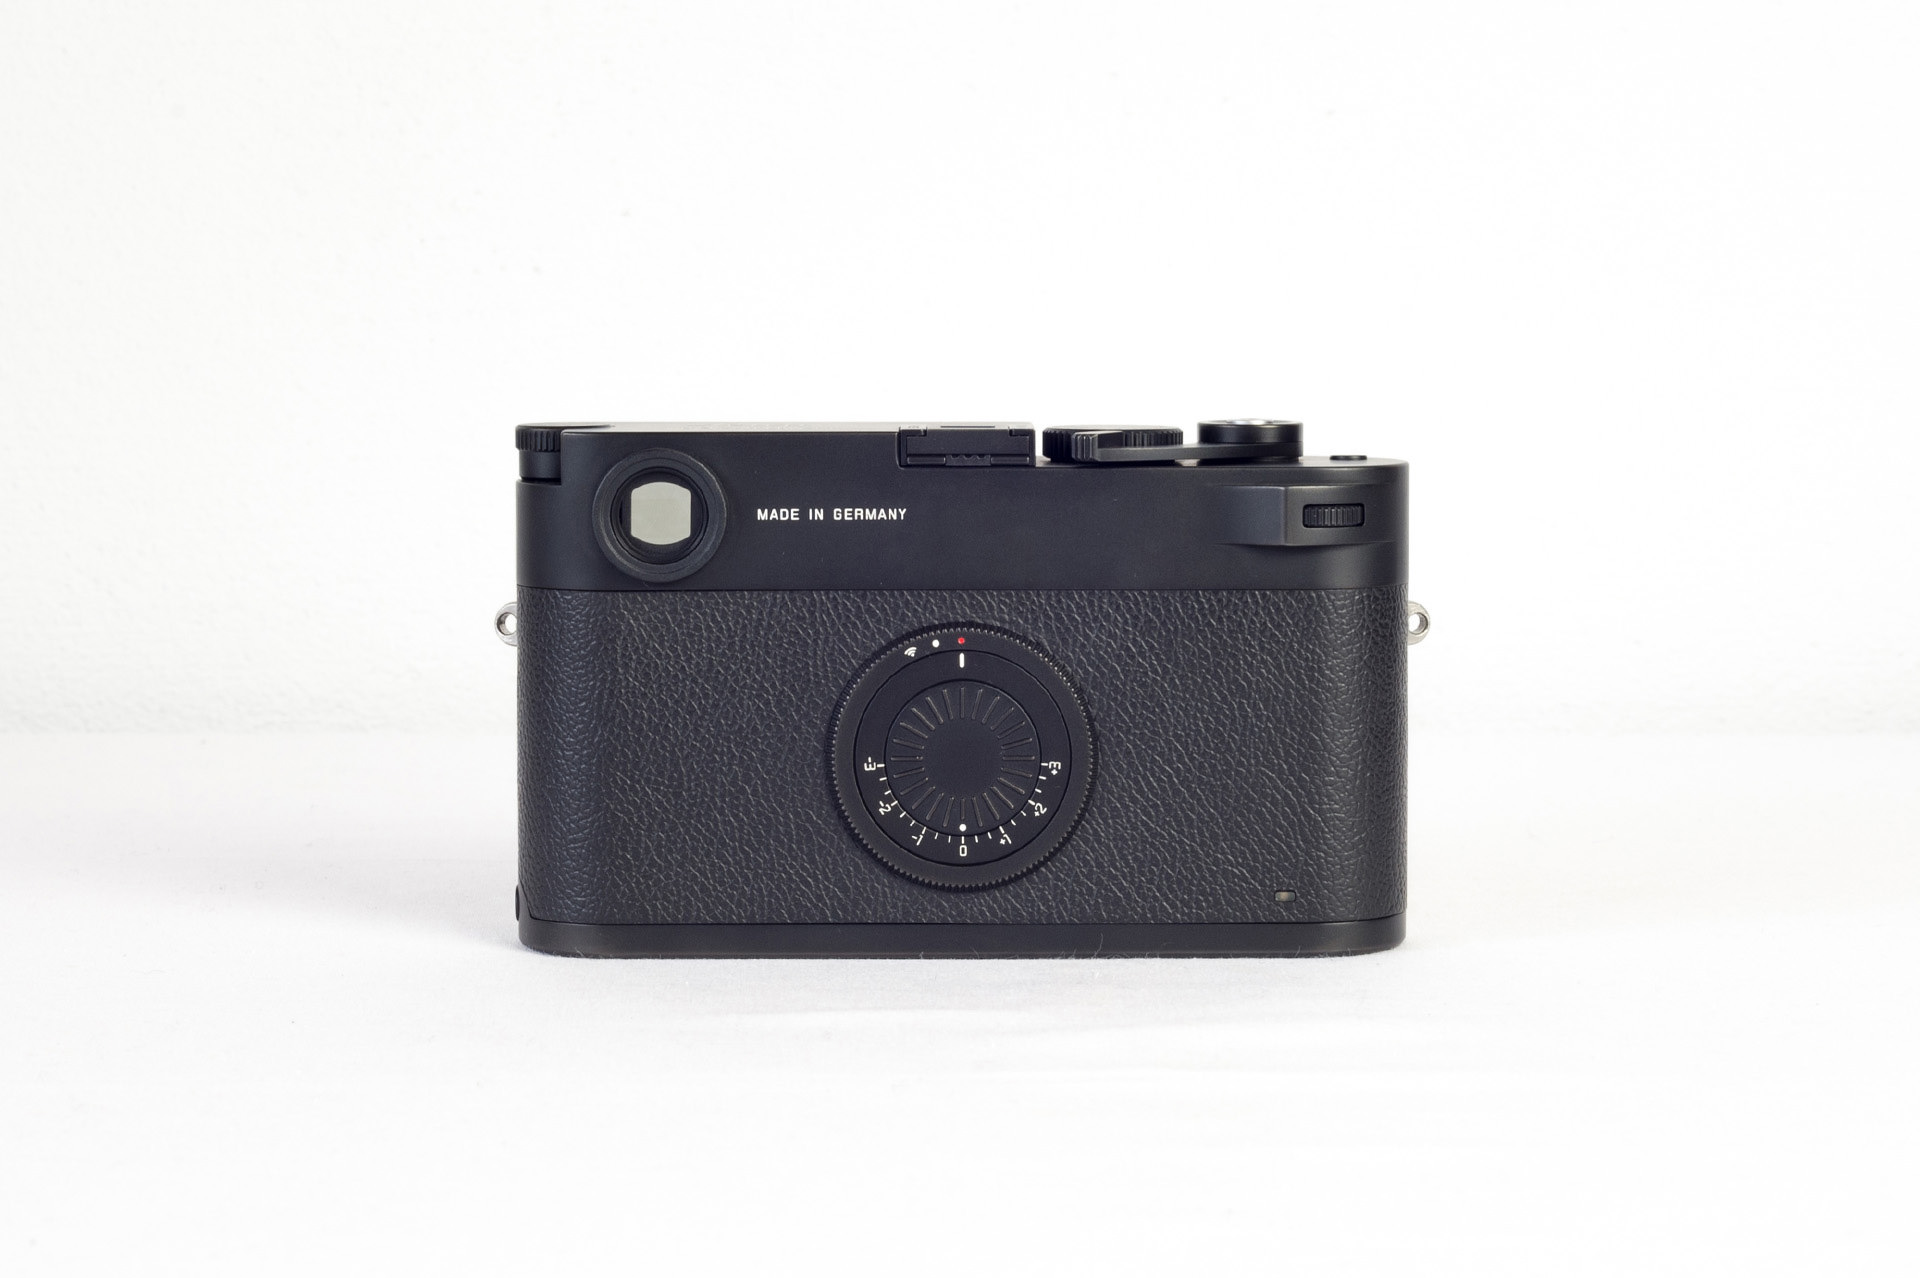 Leica M10-Dとは。価格は?